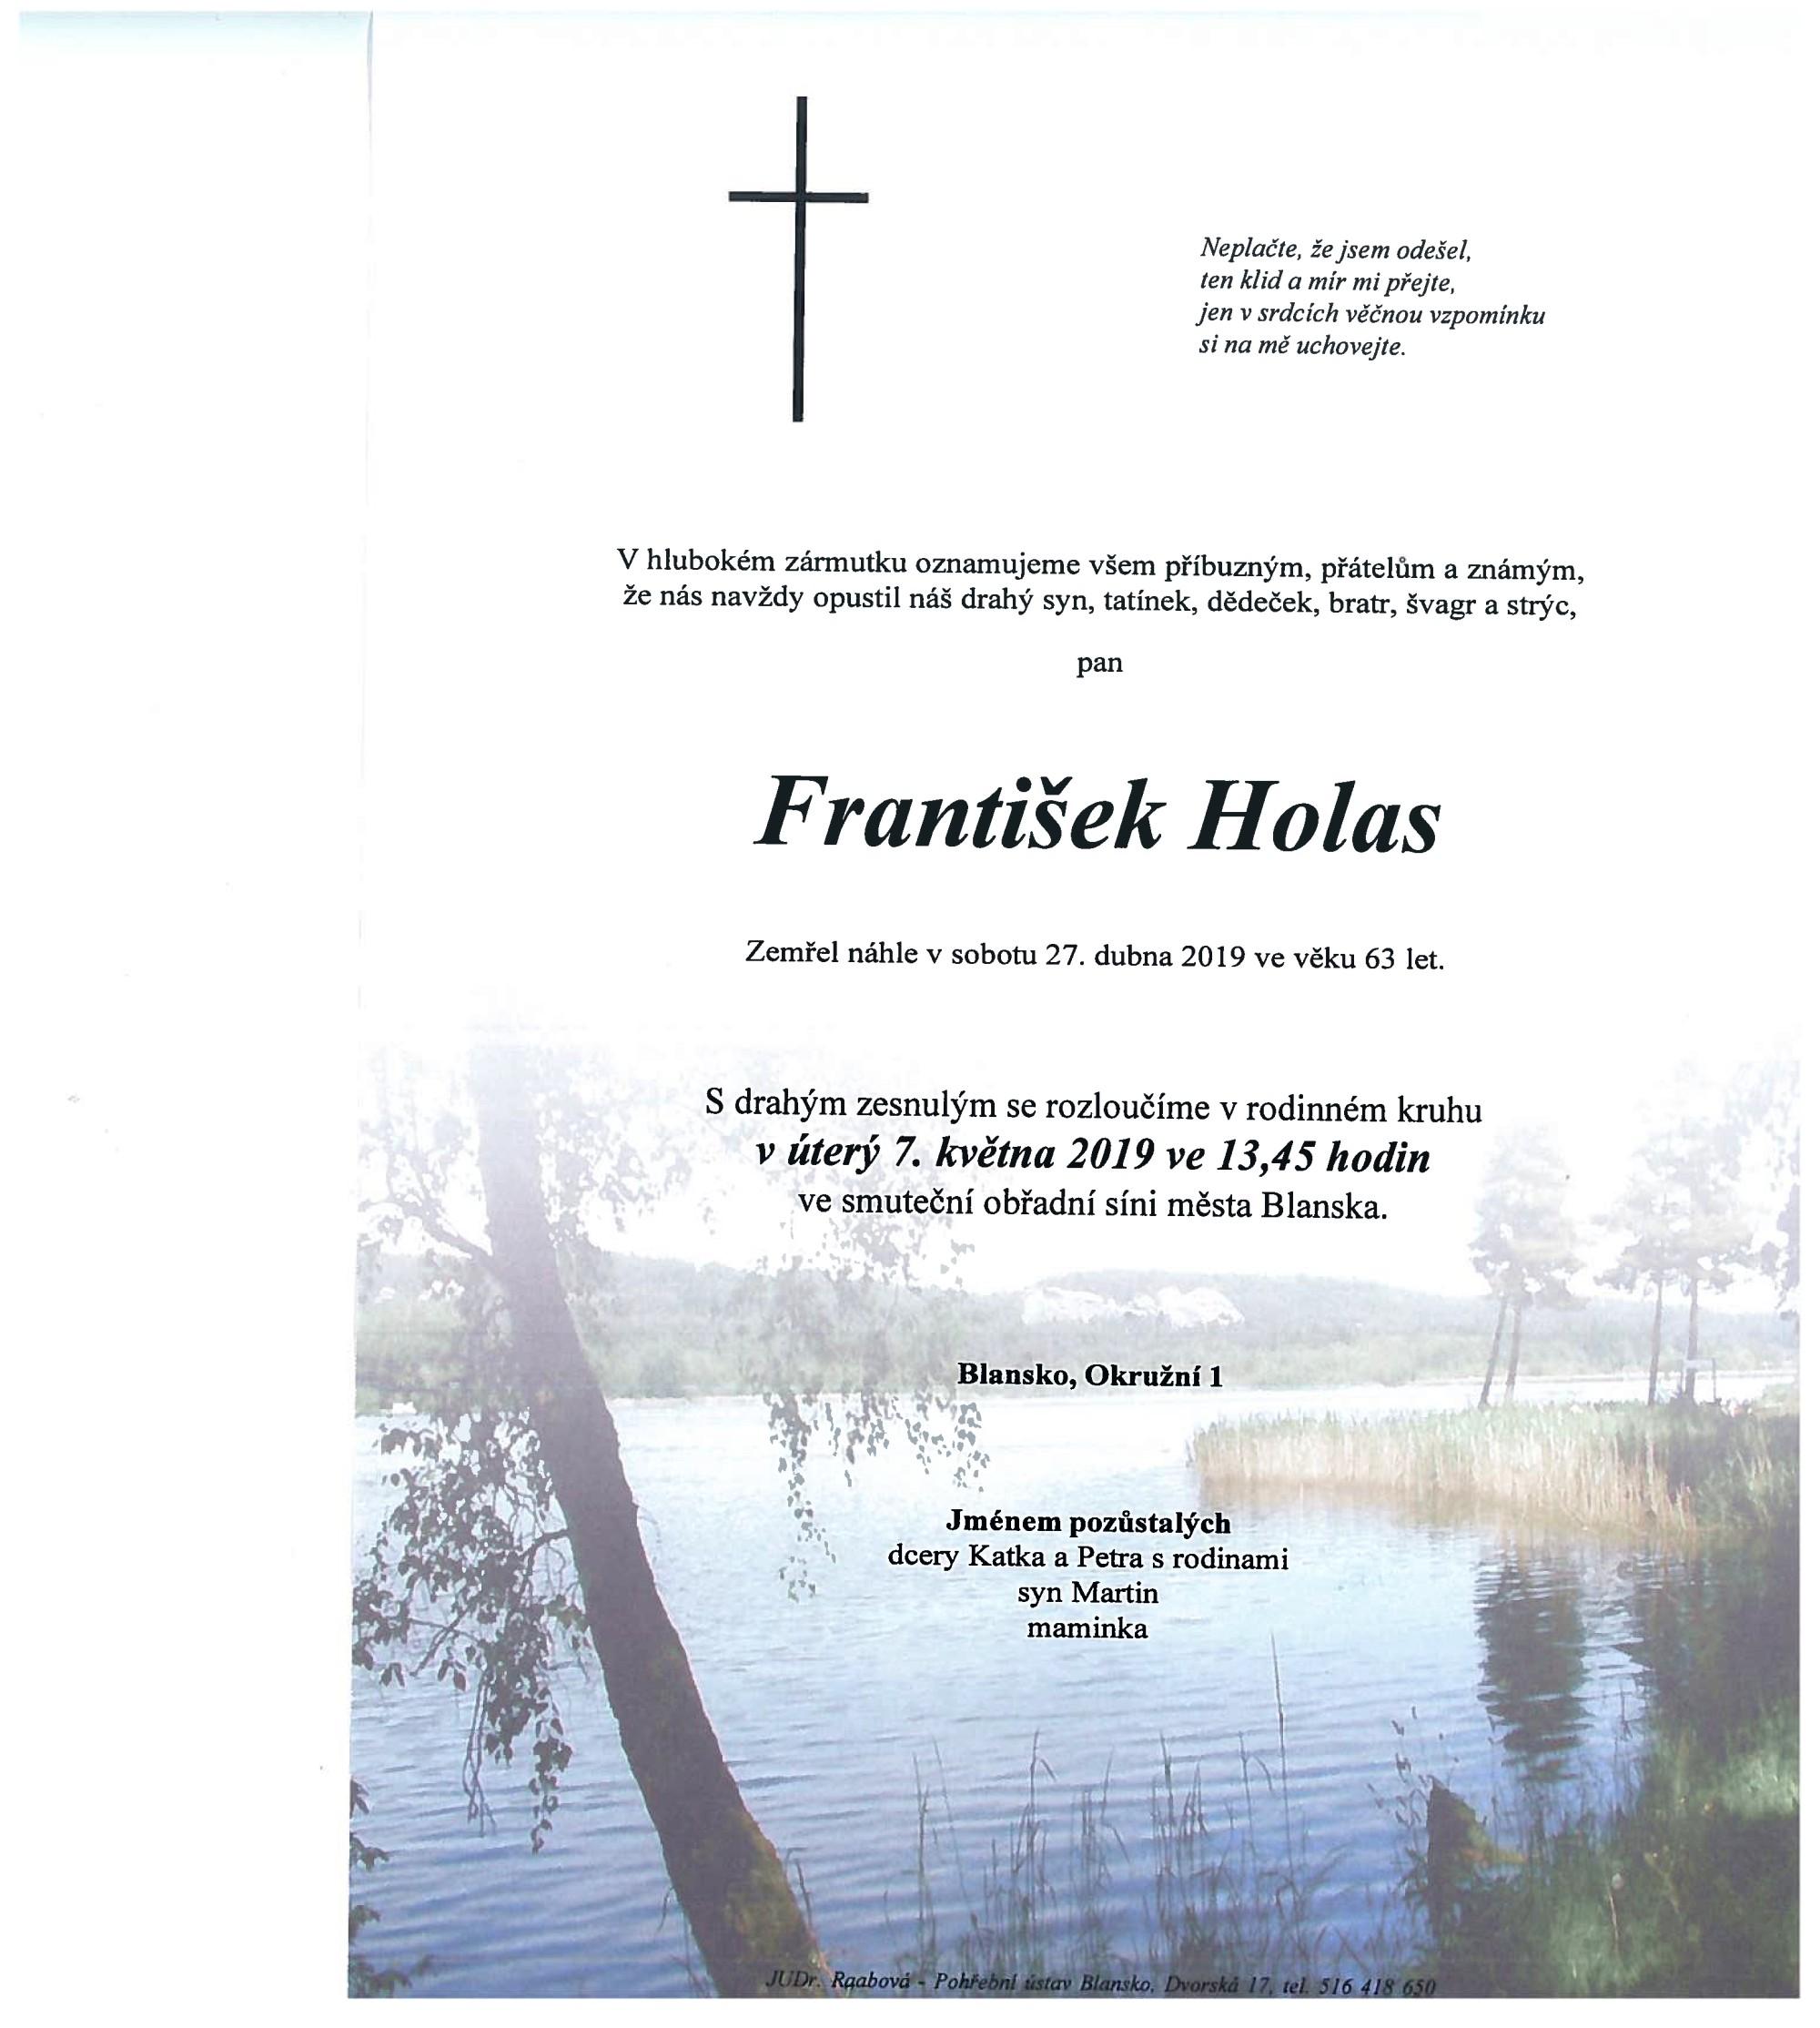 František Holas